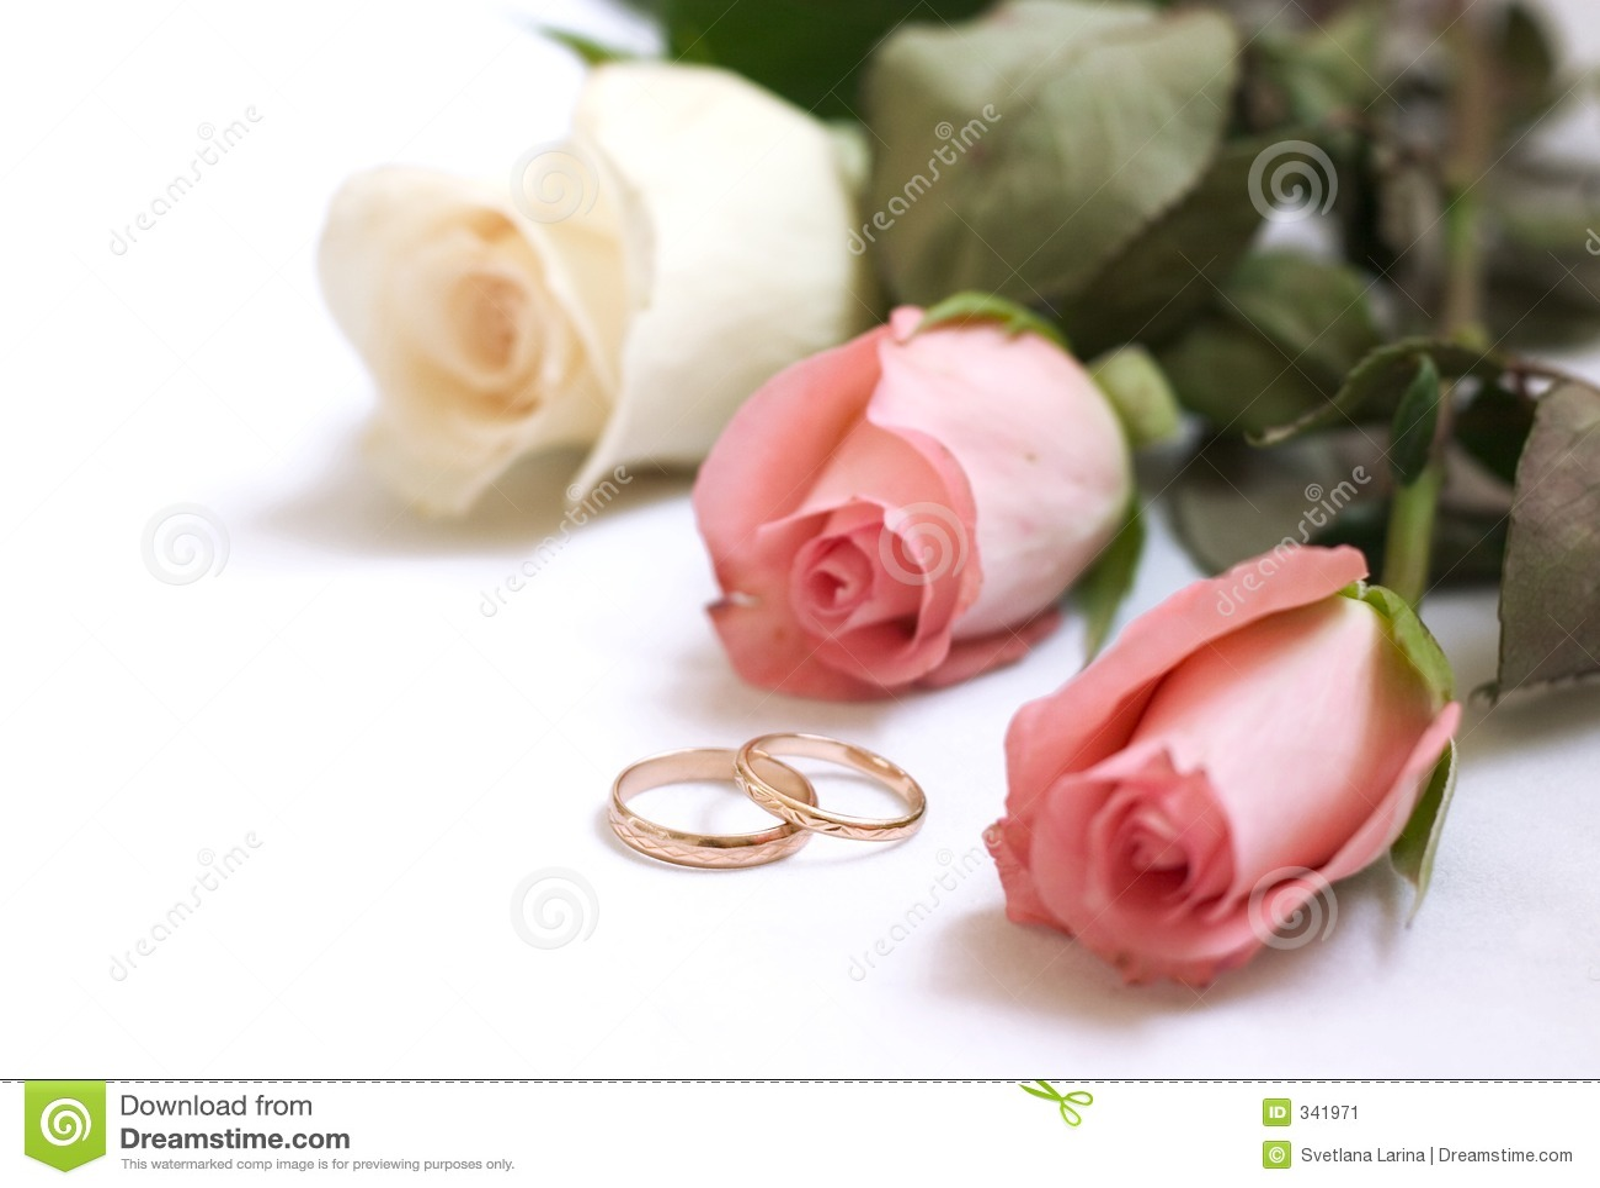 carte de mariage related keywords suggestions carte de. Black Bedroom Furniture Sets. Home Design Ideas